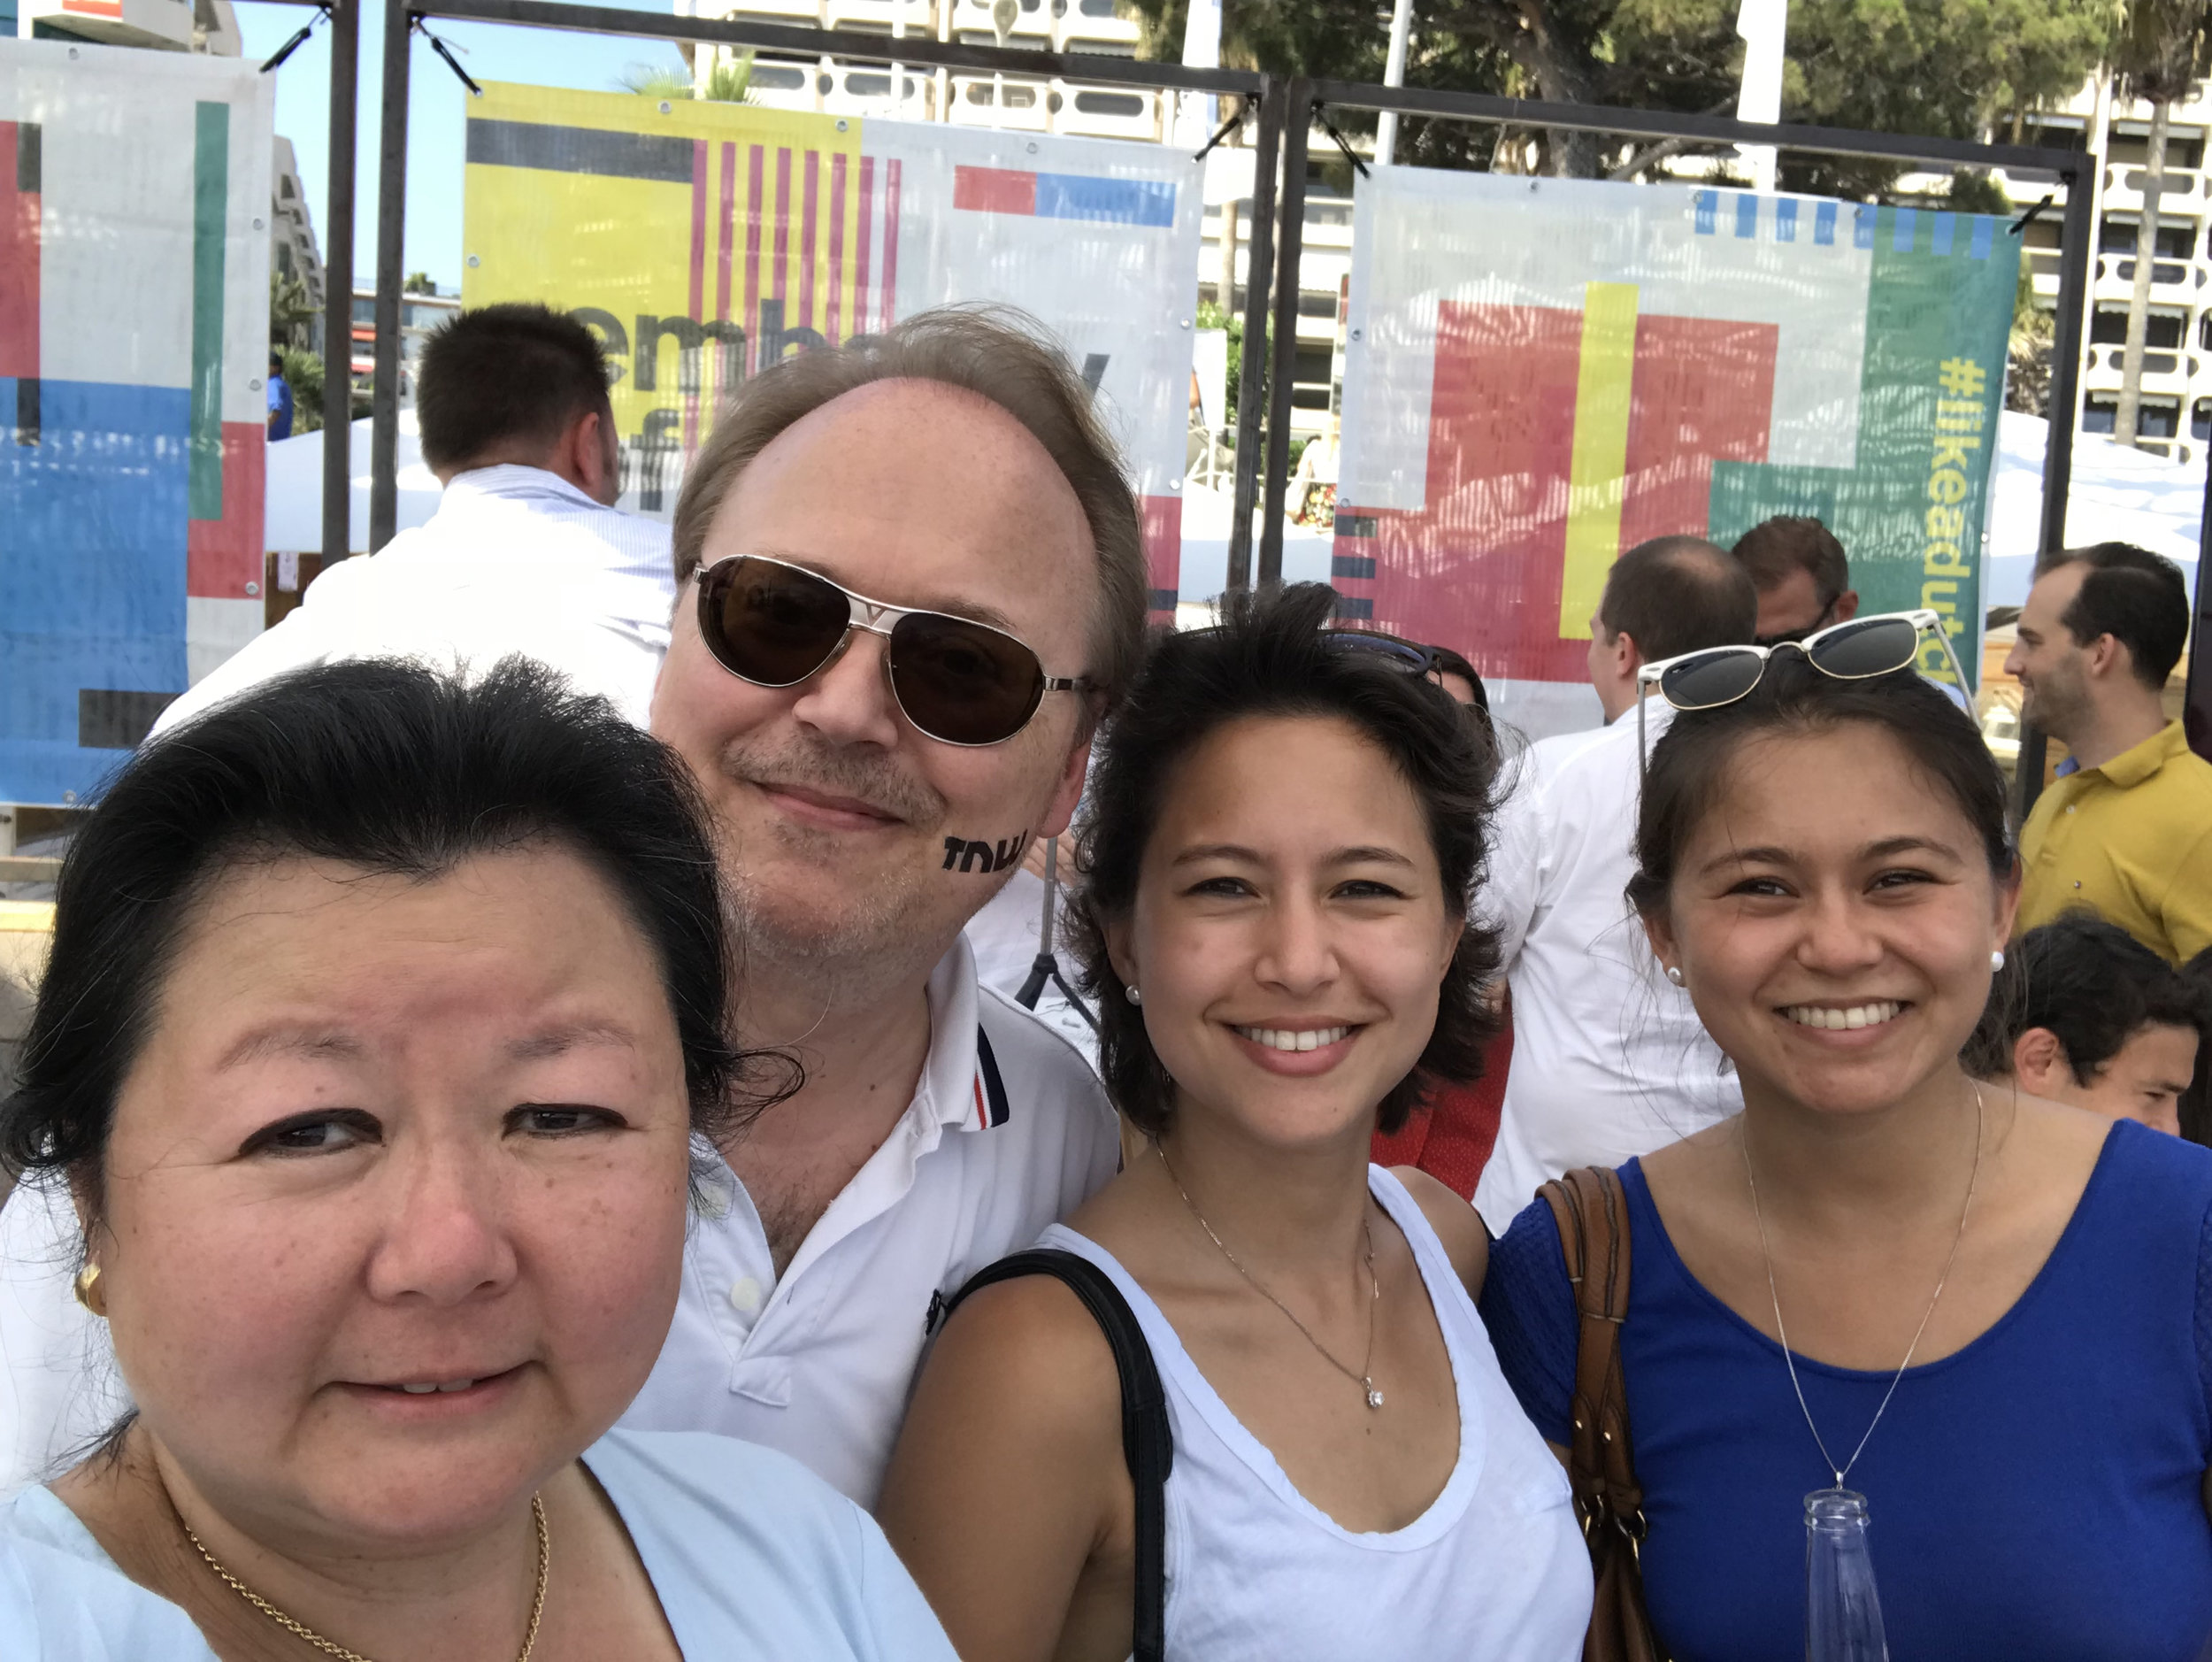 Mindus team (from left): Nathalie (CEO), Christopher (CTO), Caroline (PR) and Charlotte (Marketing)